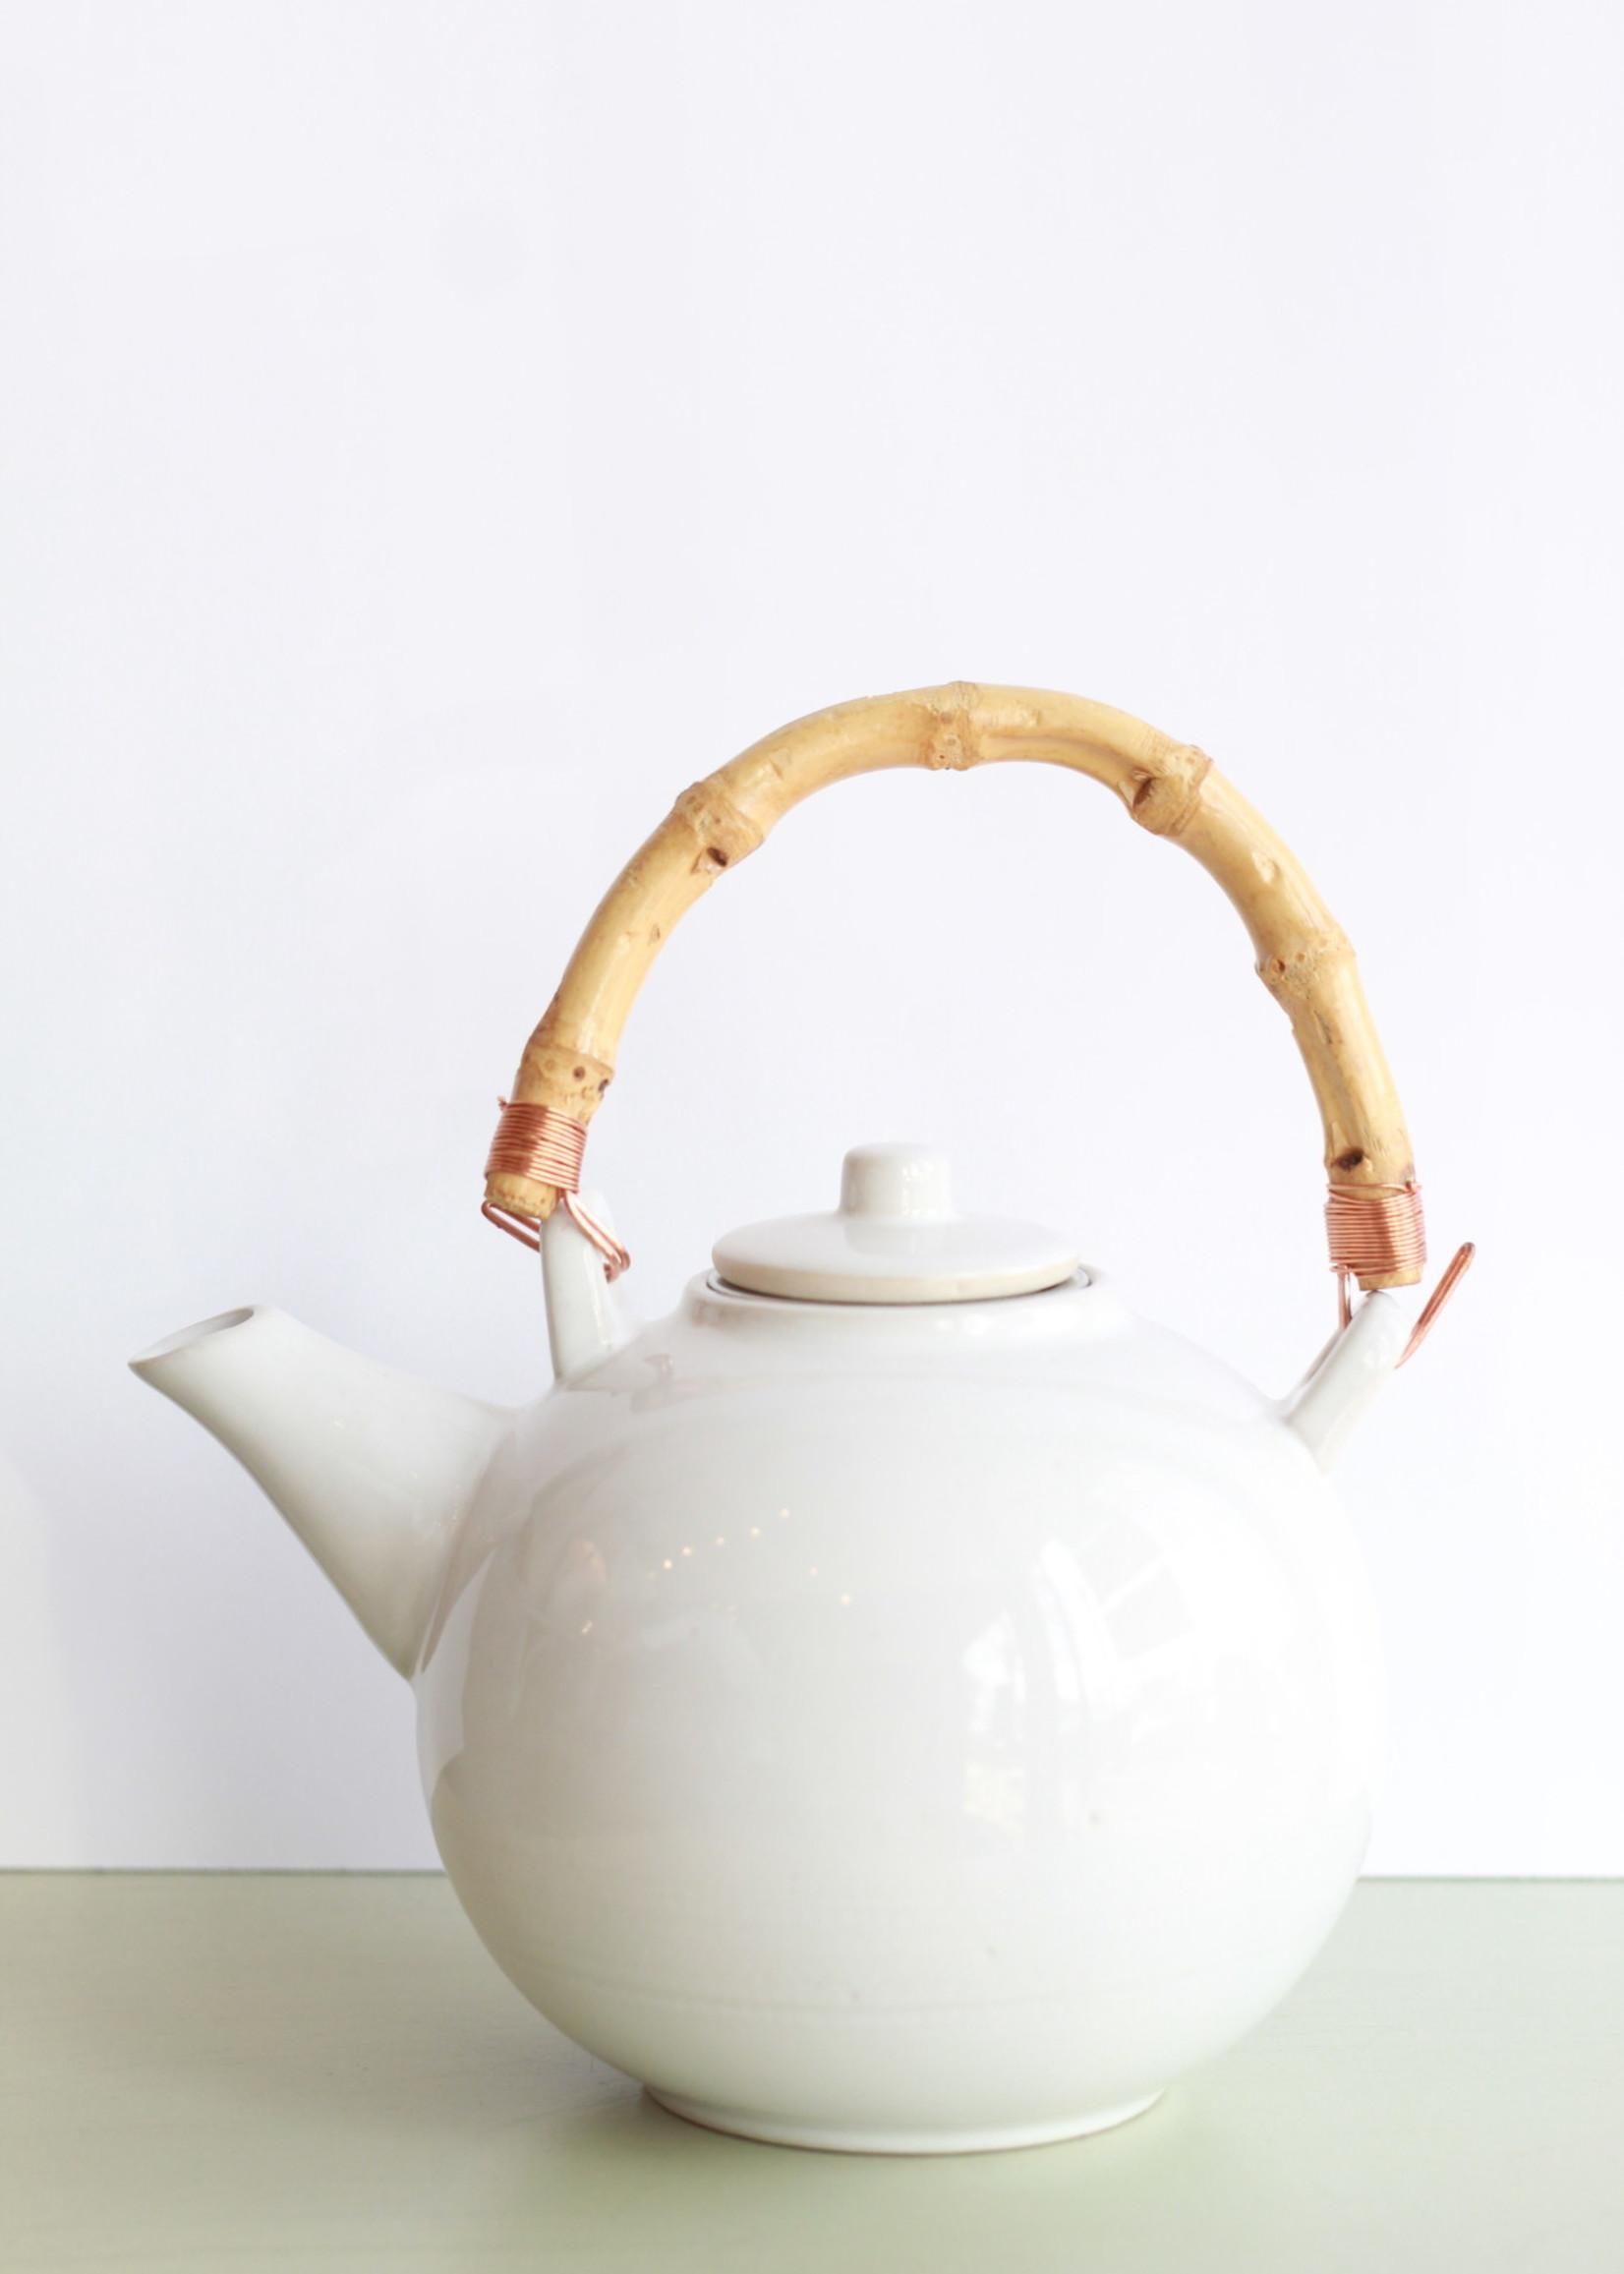 Tea Pot With Bamboo Handle & Metal Strainer